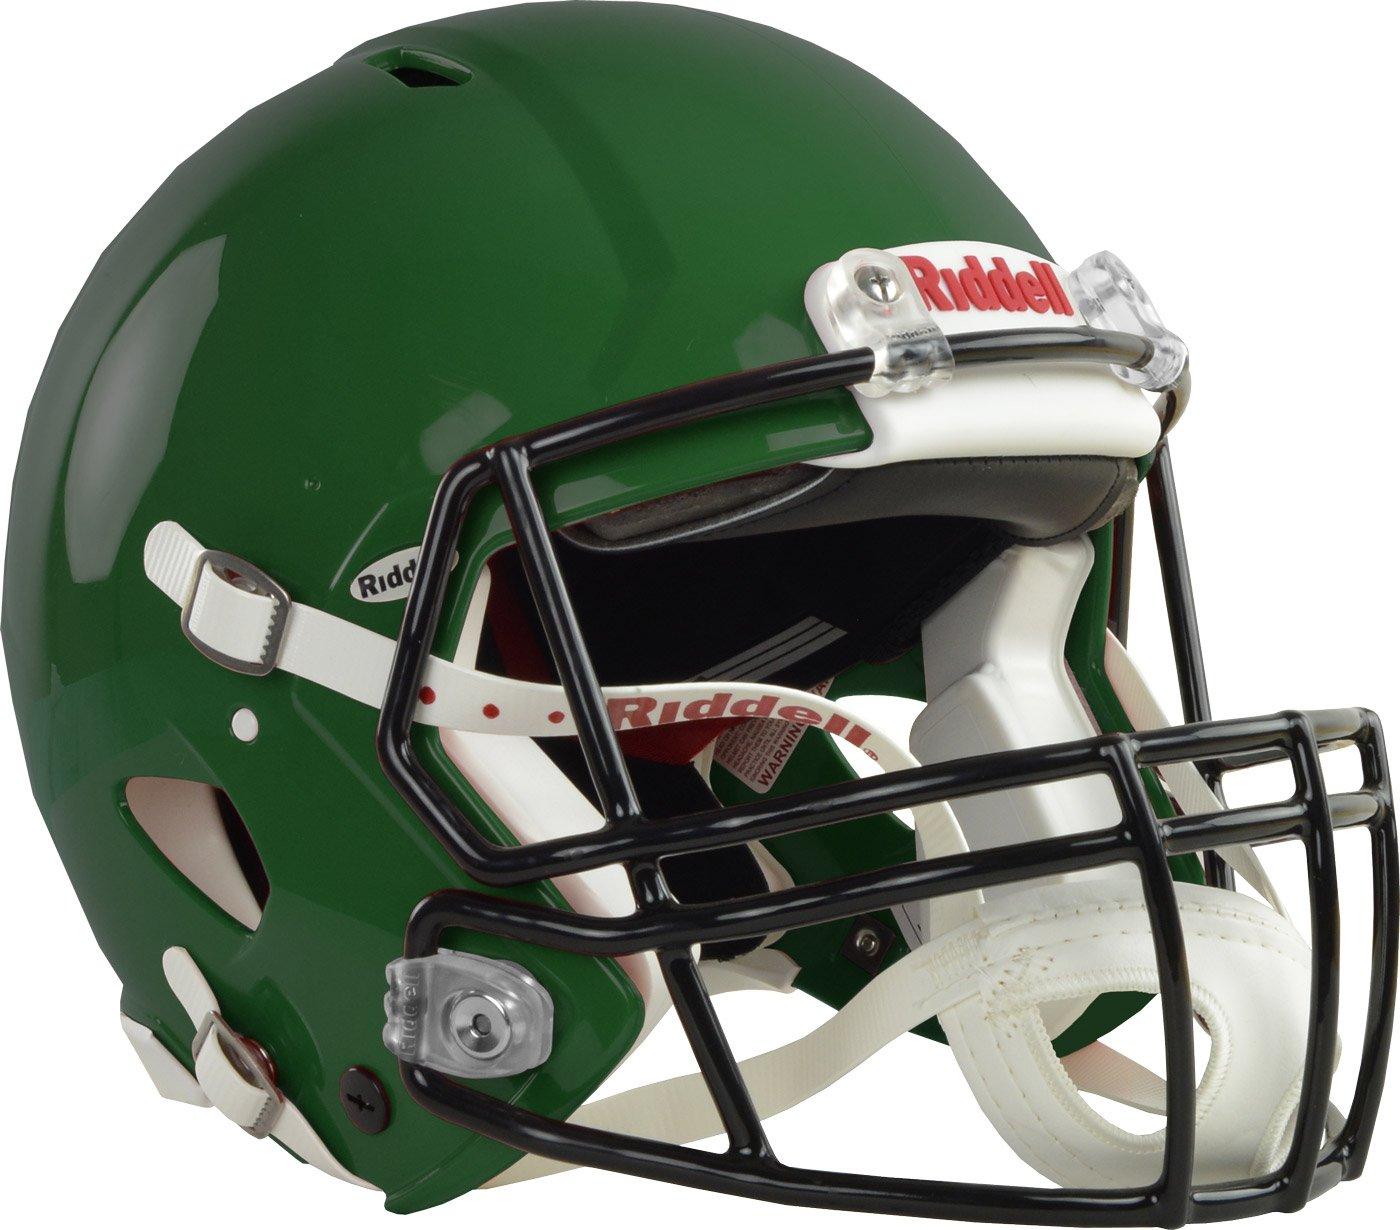 92148e4ca95 Riddell speed icon adult football helmet sports outdoors jpg 1400x1230 Football  helmets visor inserts custom nike